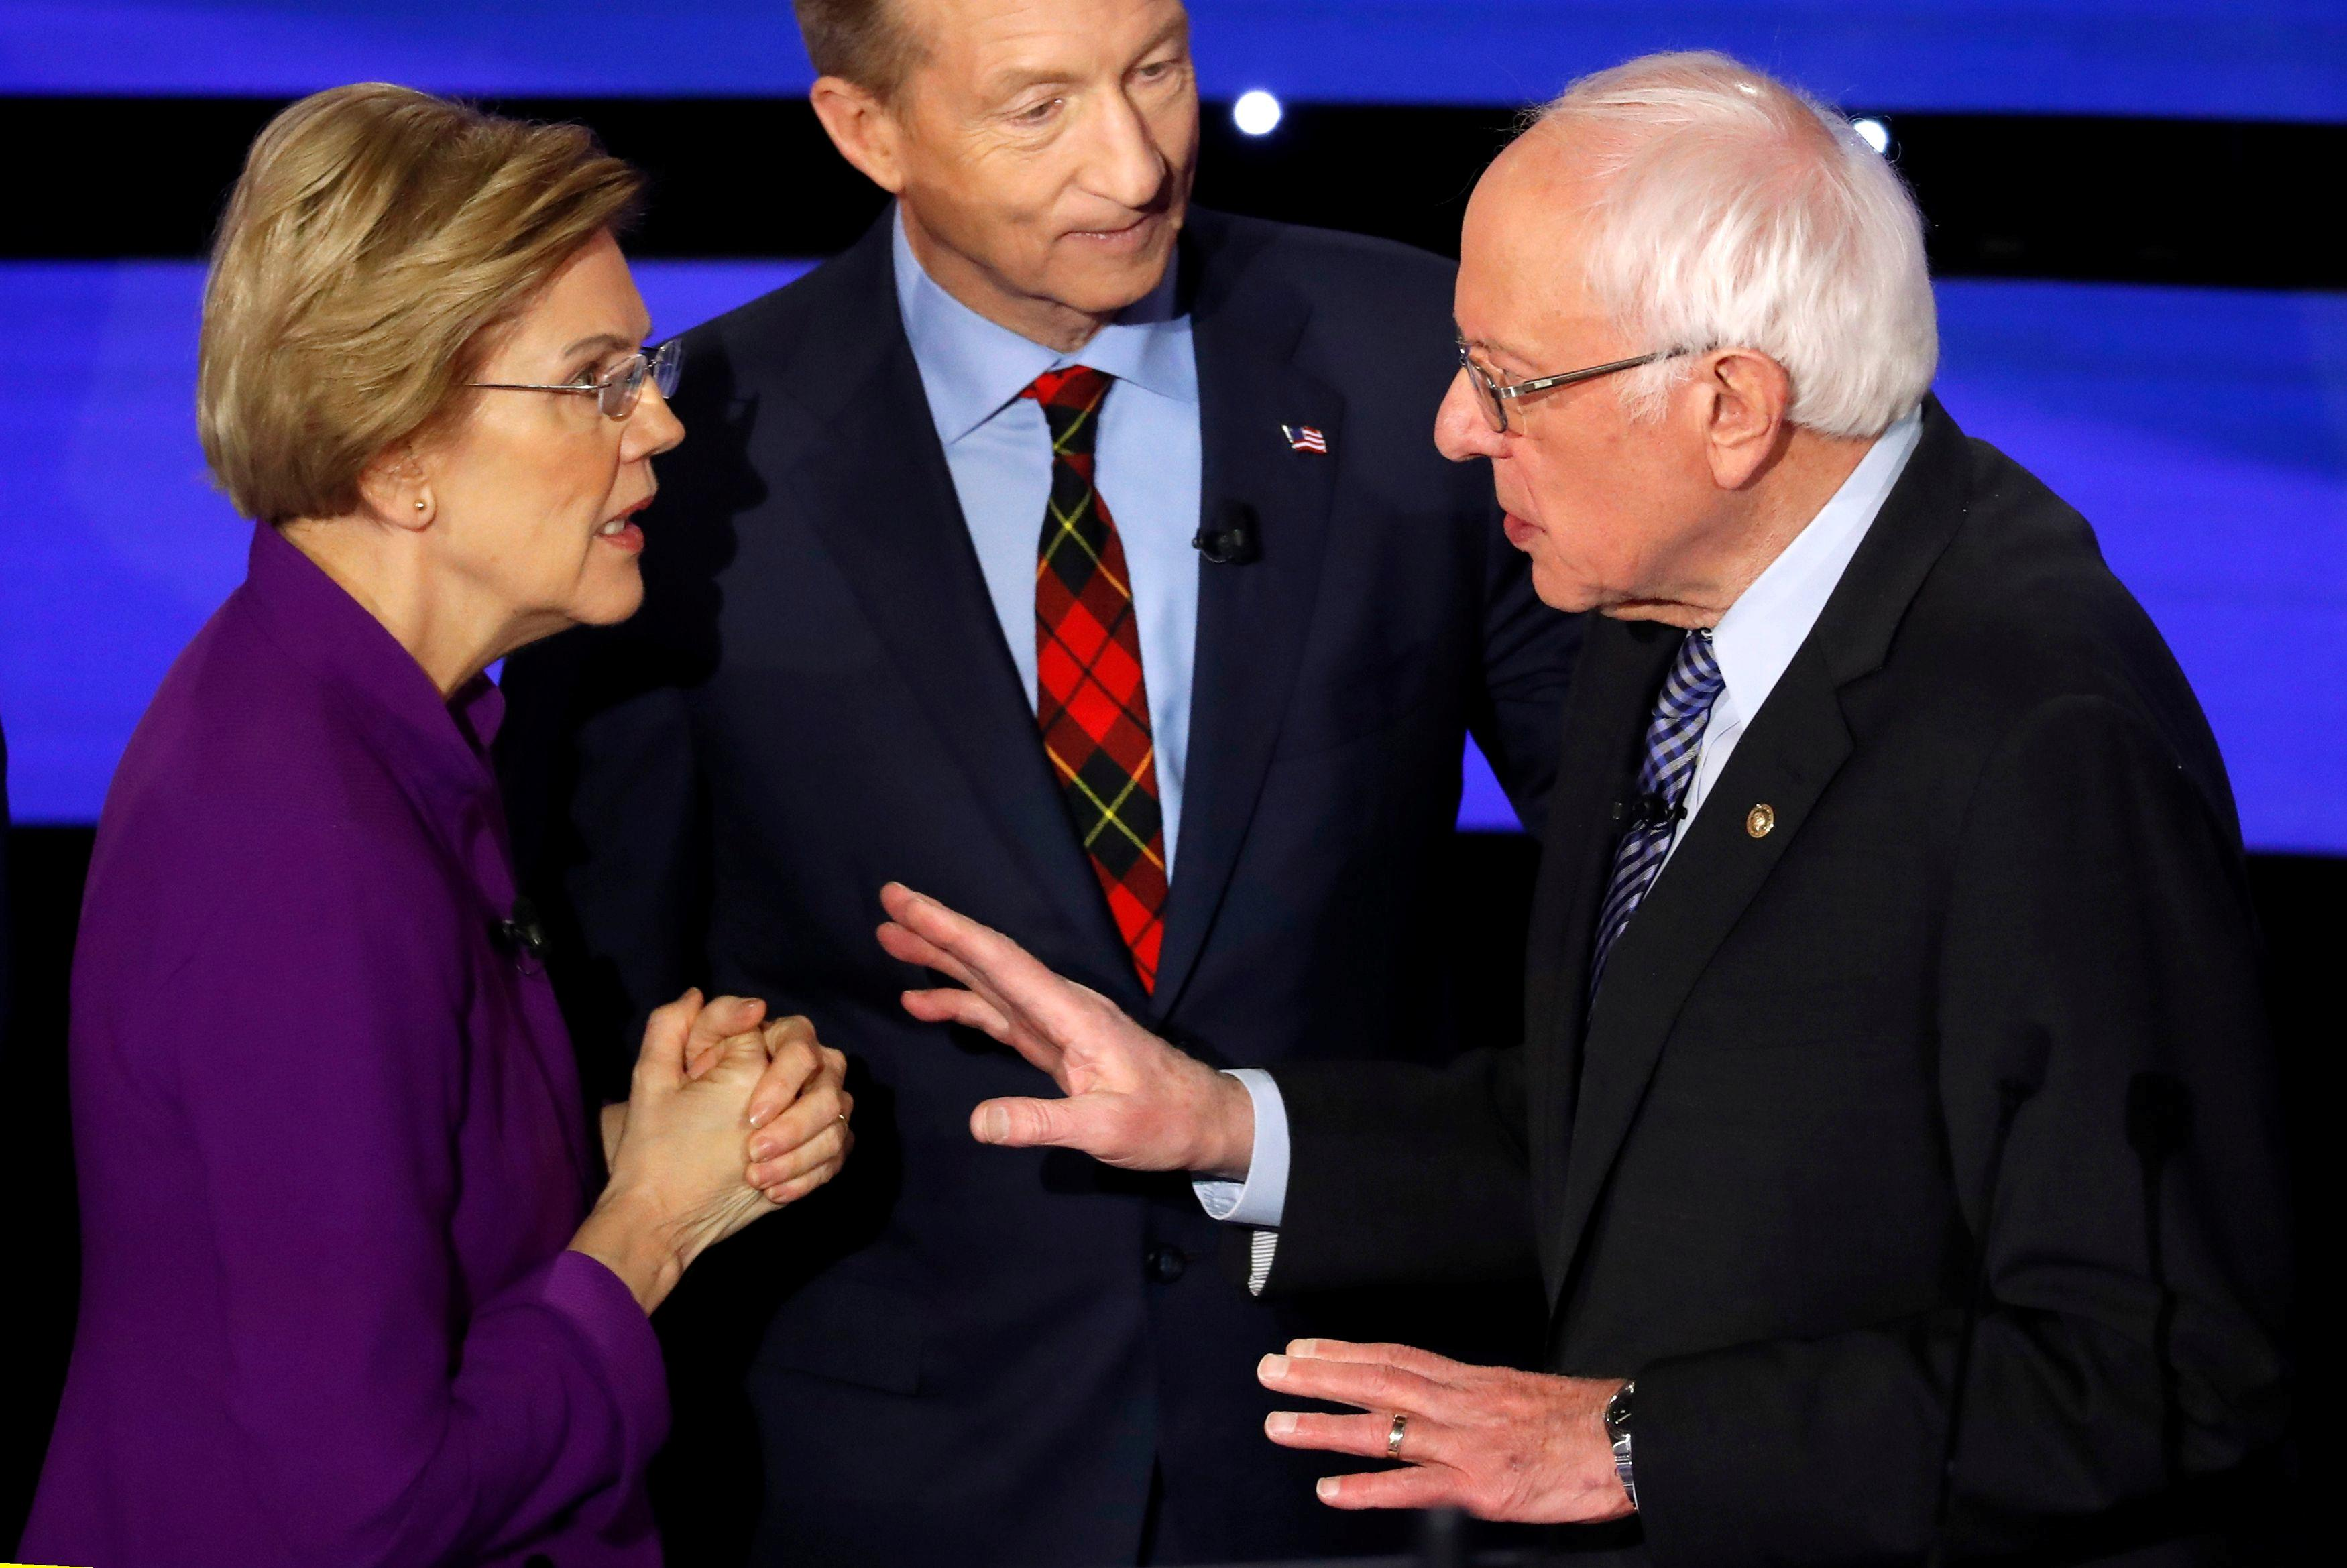 Flap with Warren knocks Sanders' strategy off course